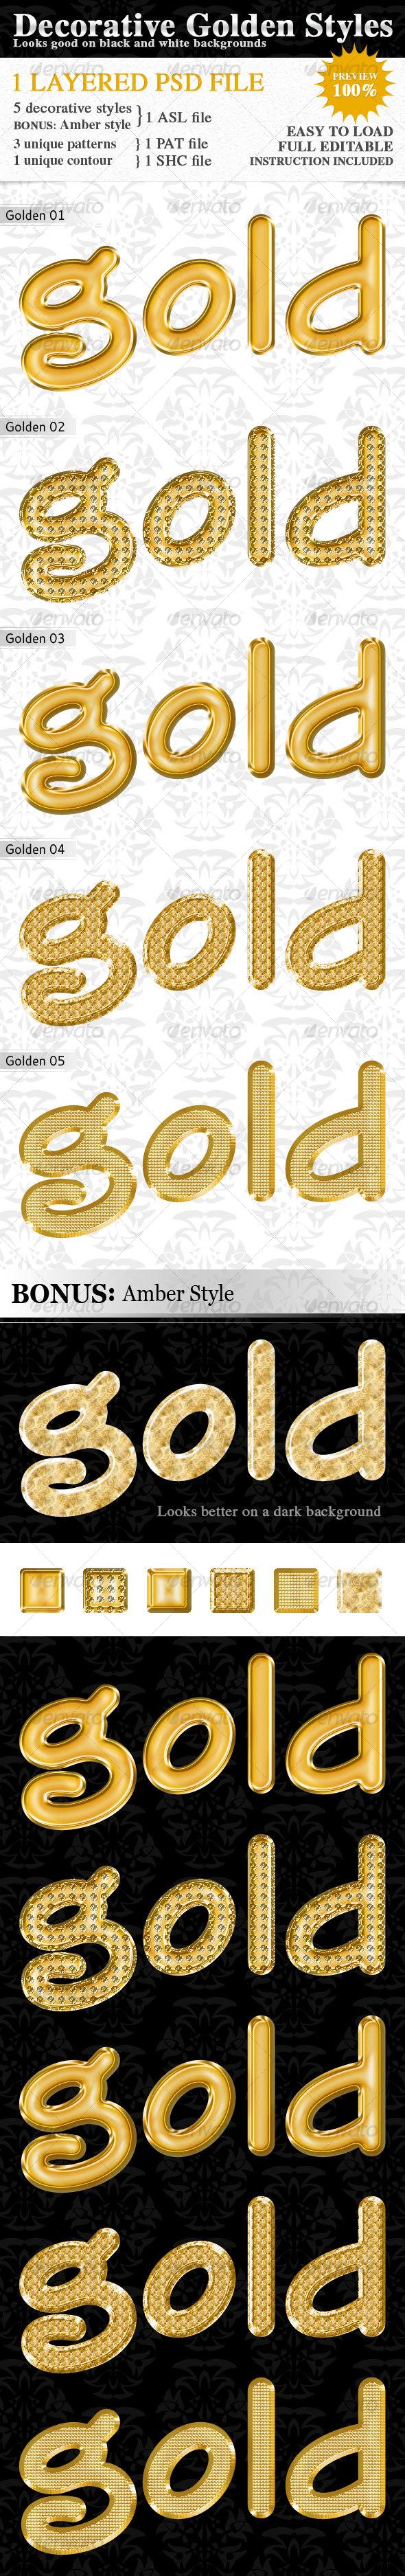 GraphicRiver Decorative Golden Styles 116266